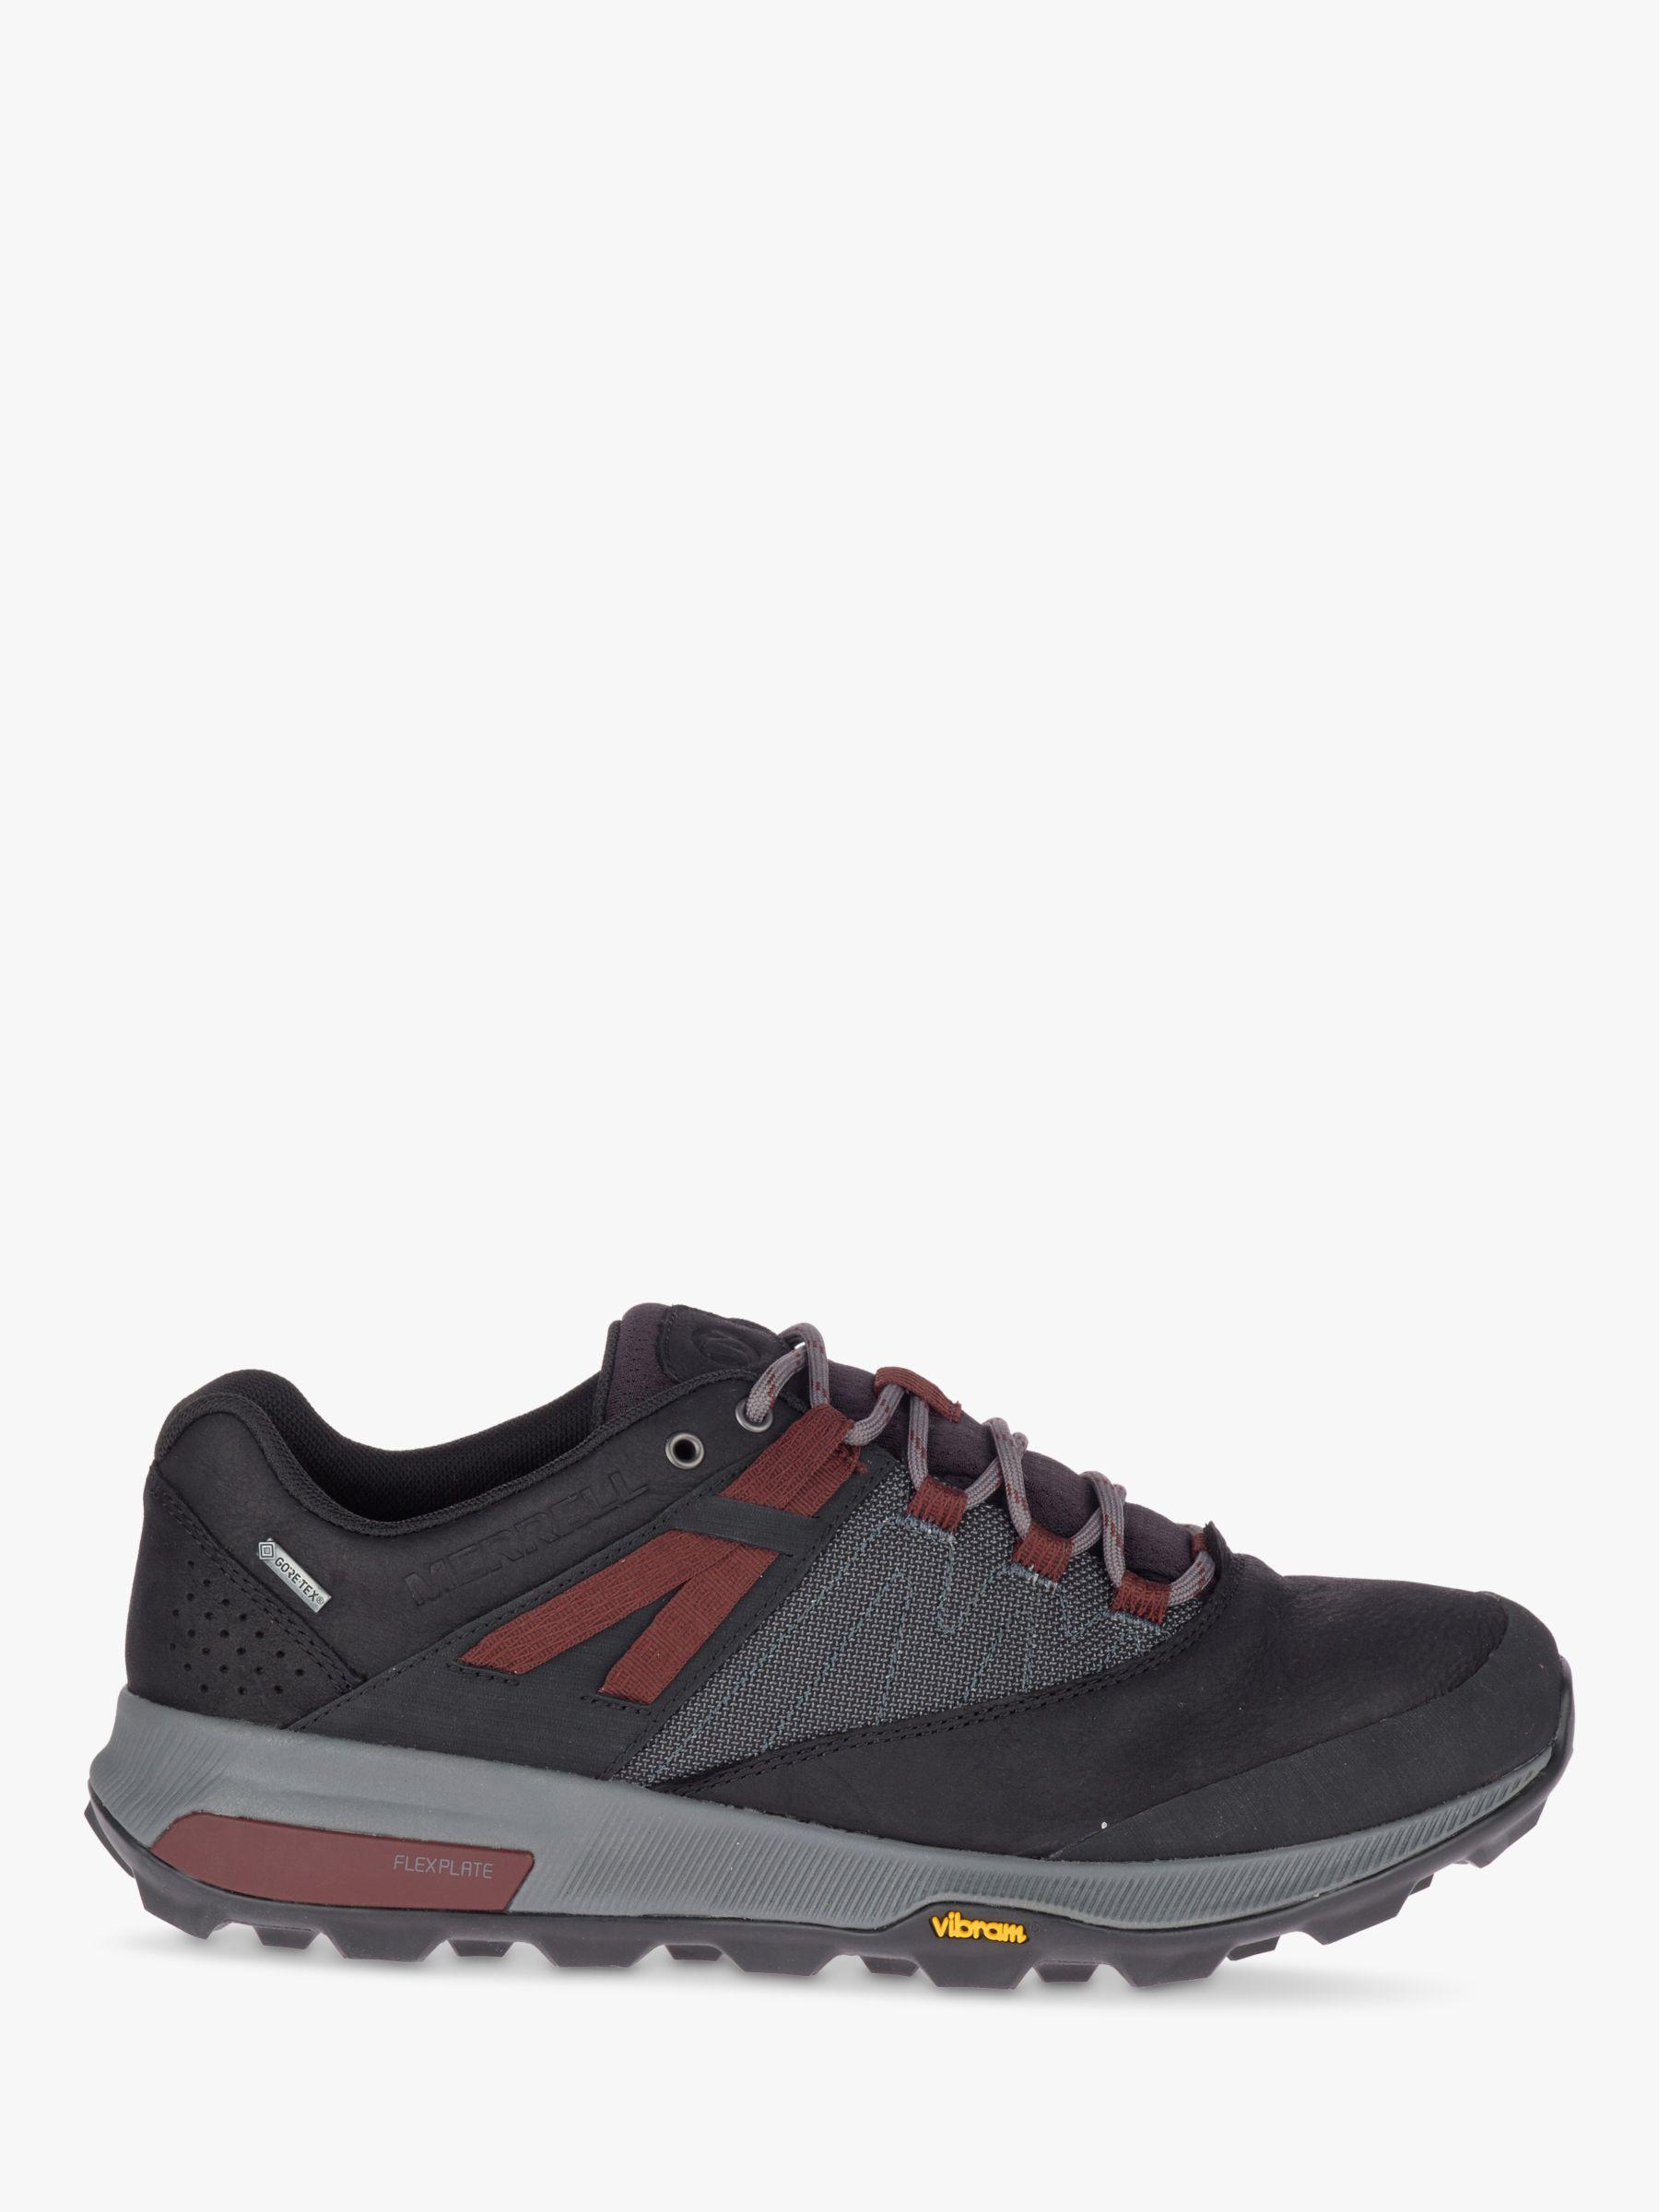 Merrell Merrell Zion Men's Waterproof Gore-Tex Hiking Shoes, Black